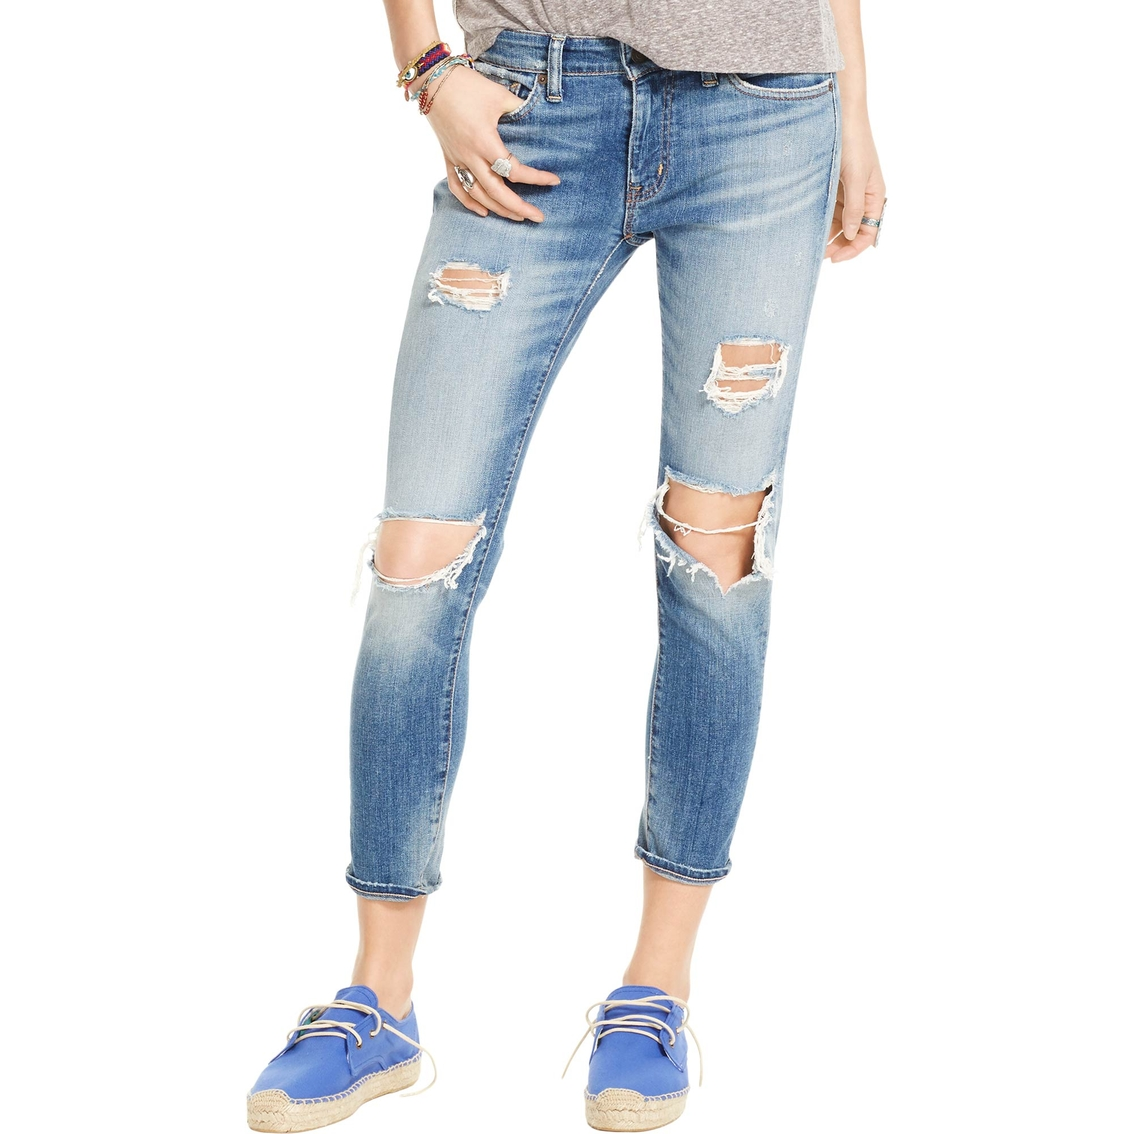 4ef37f9a02 Denim & Supply Ralph Lauren Kayla 5 Pocket Cropped Skinny Jean ...